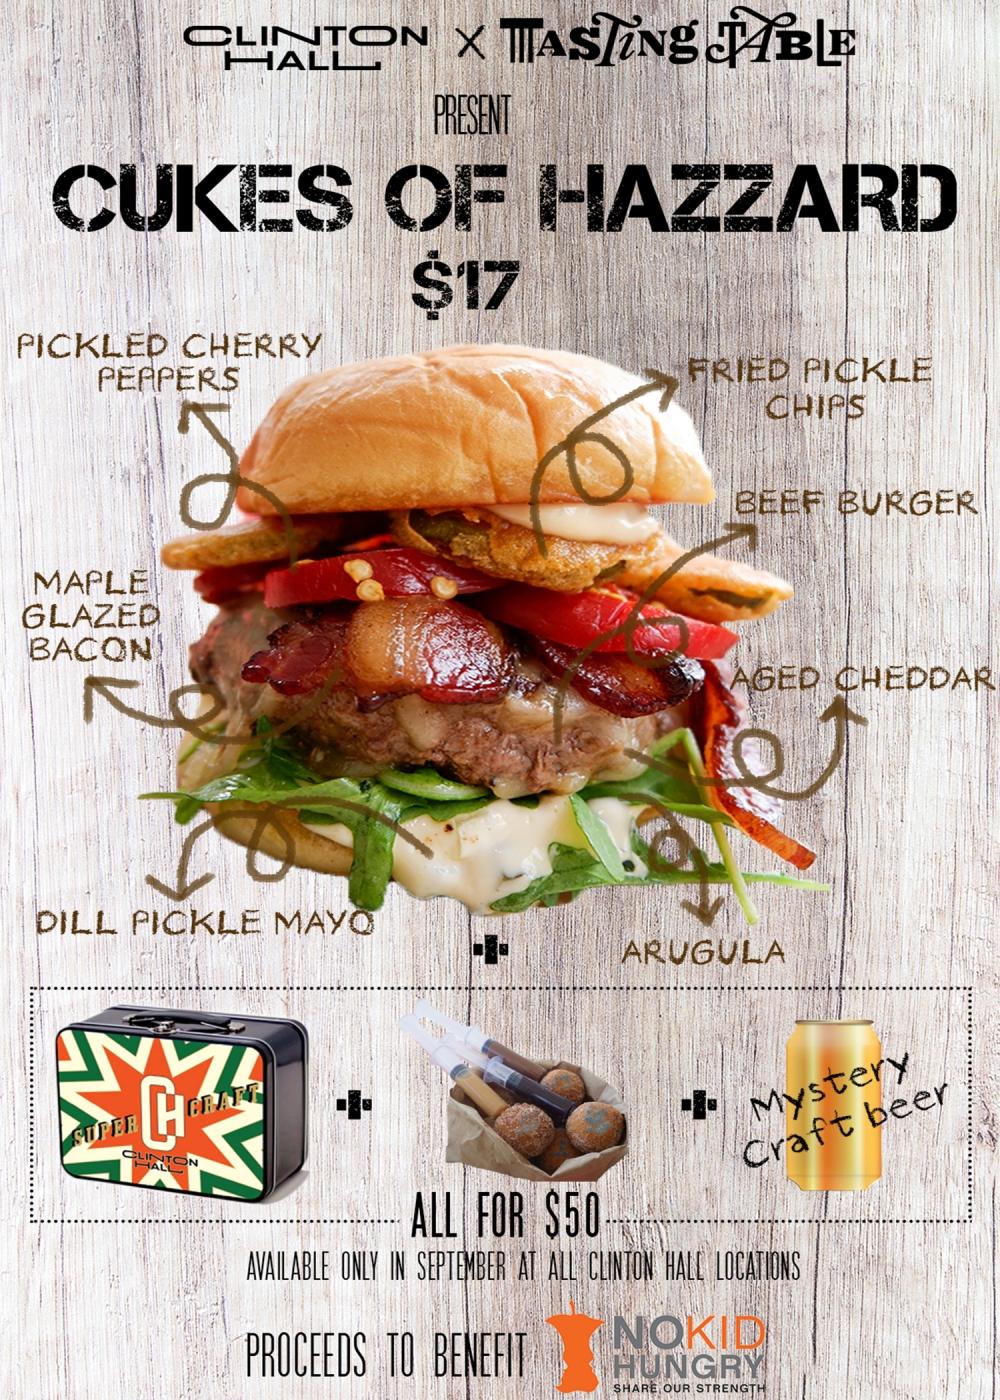 20170830 cukes of hazzard 5x7